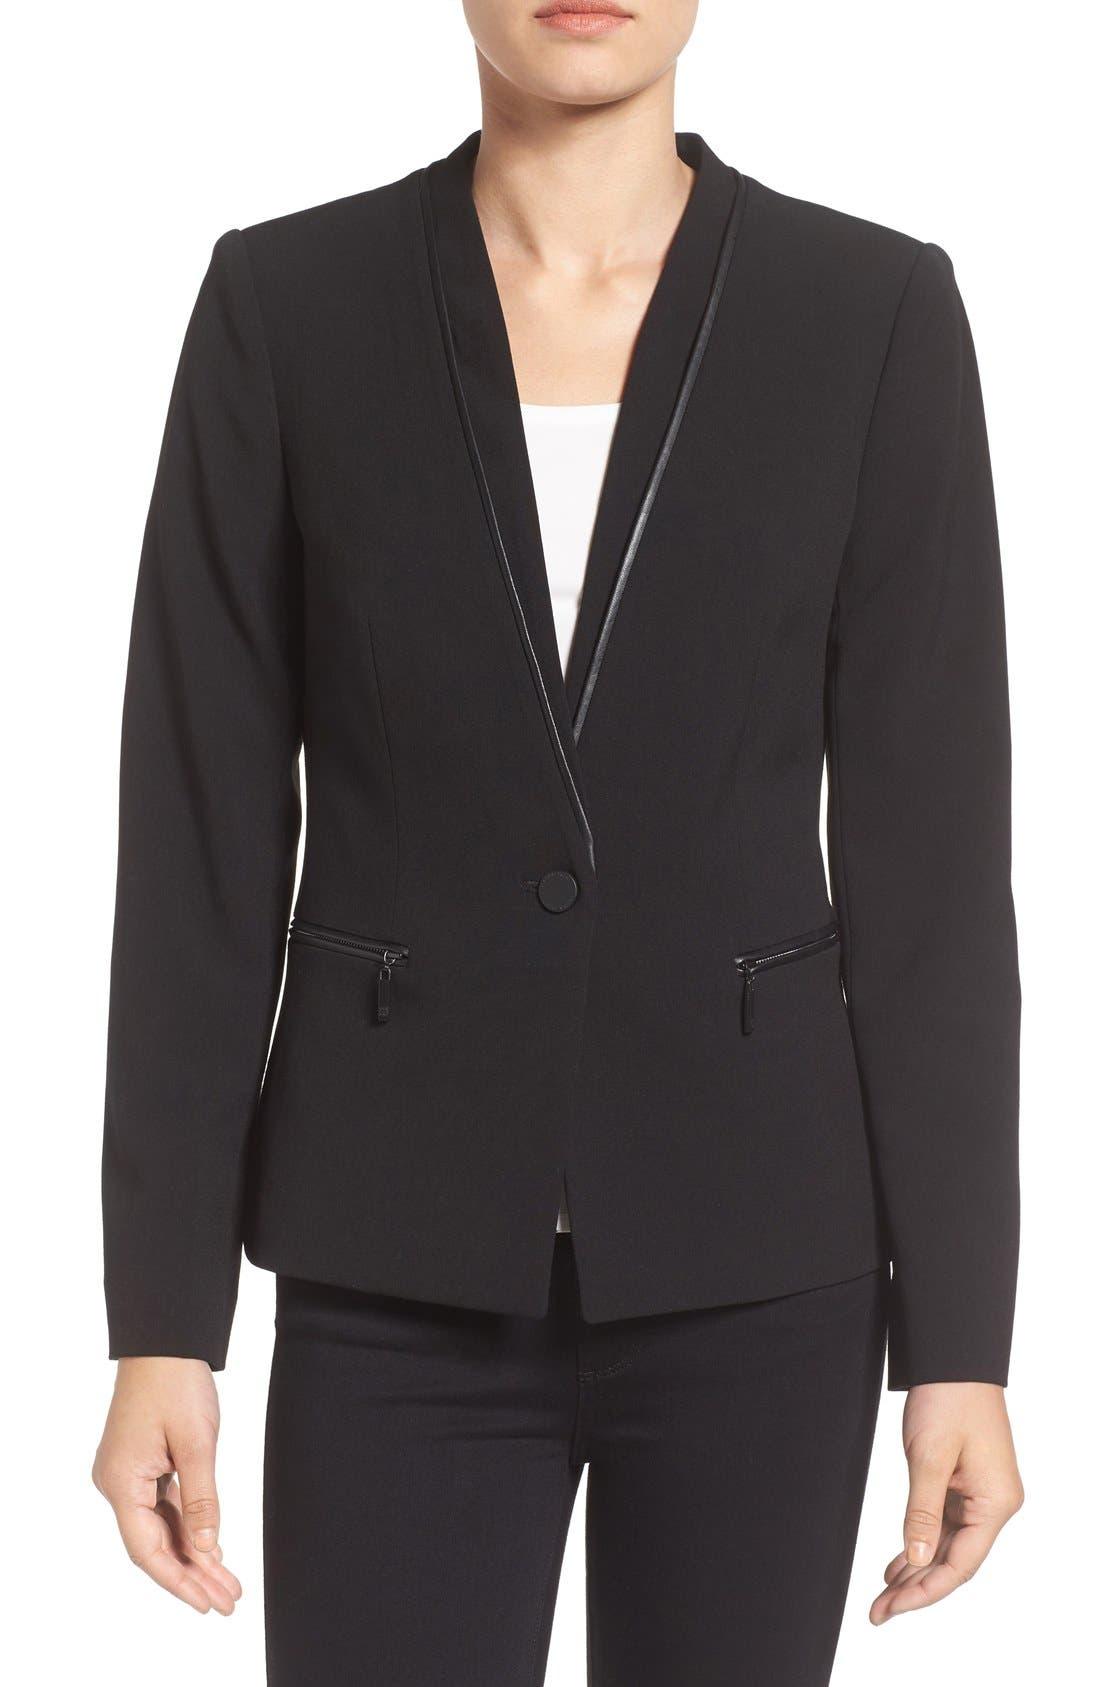 Main Image - Ivanka Trump Faux Leather Trim Suit Jacket